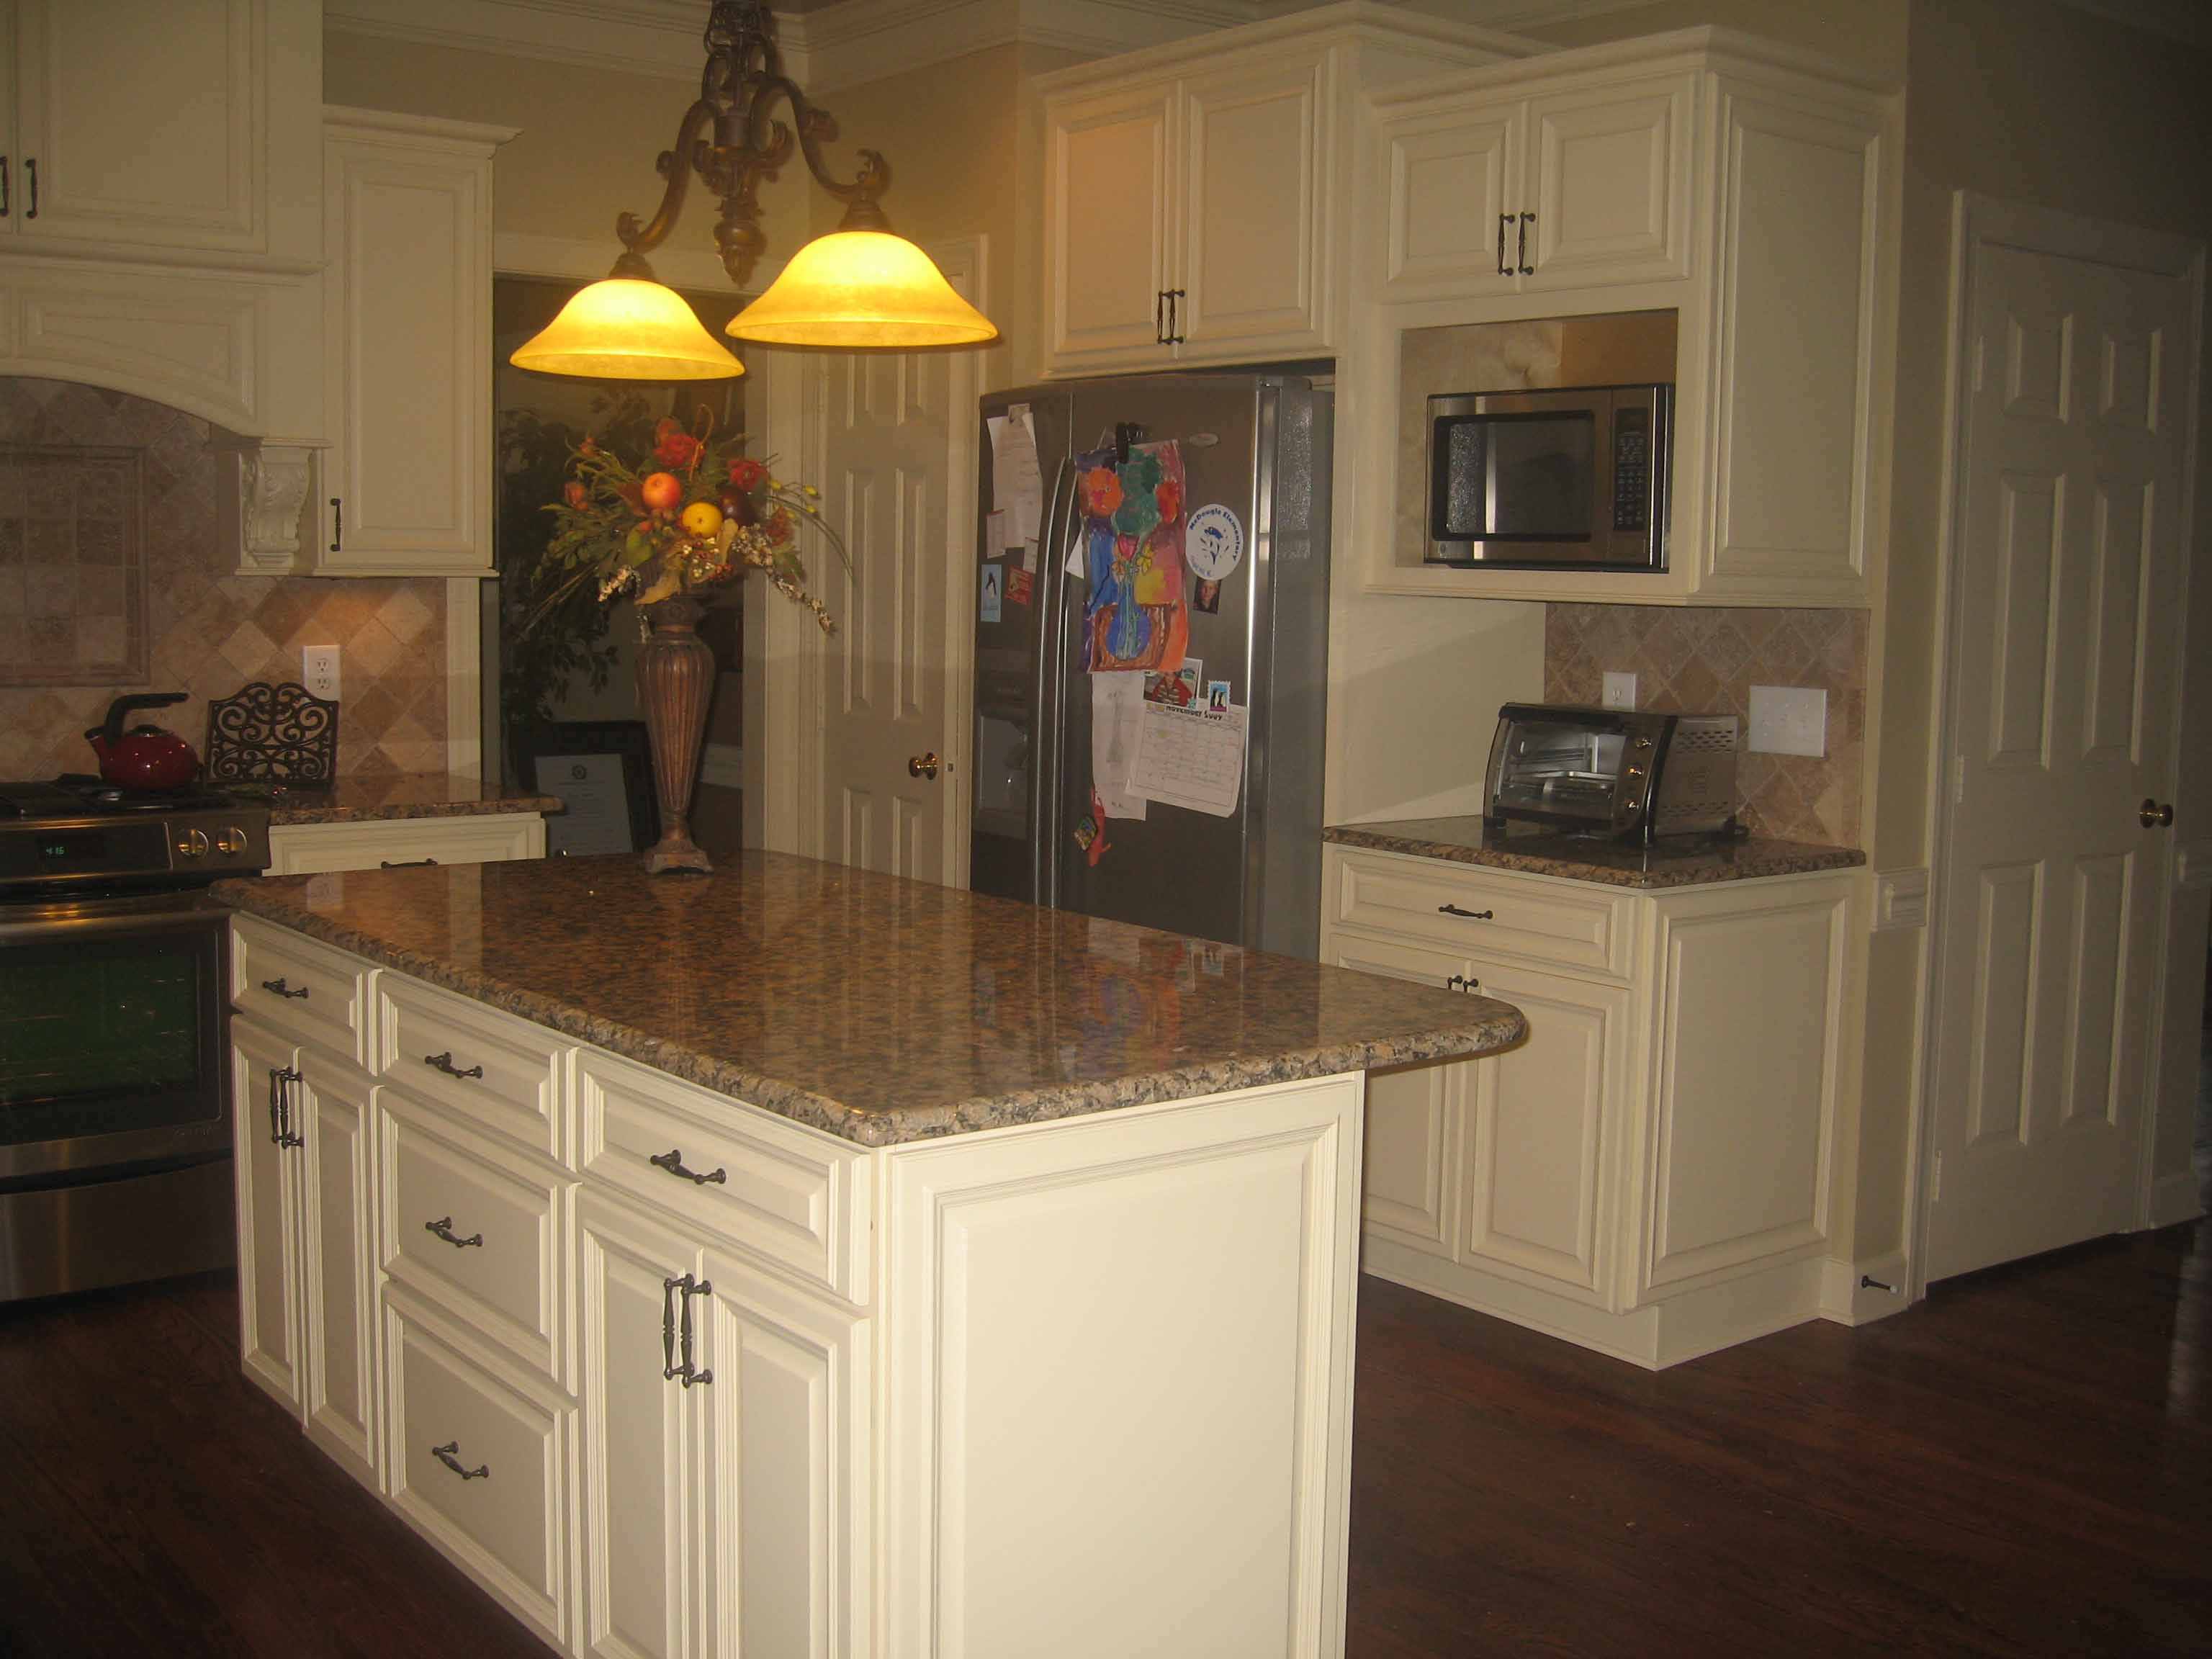 RTA Kitchen Cabinets French Vanilla rta kitchen cabinets online Buy cabinets online